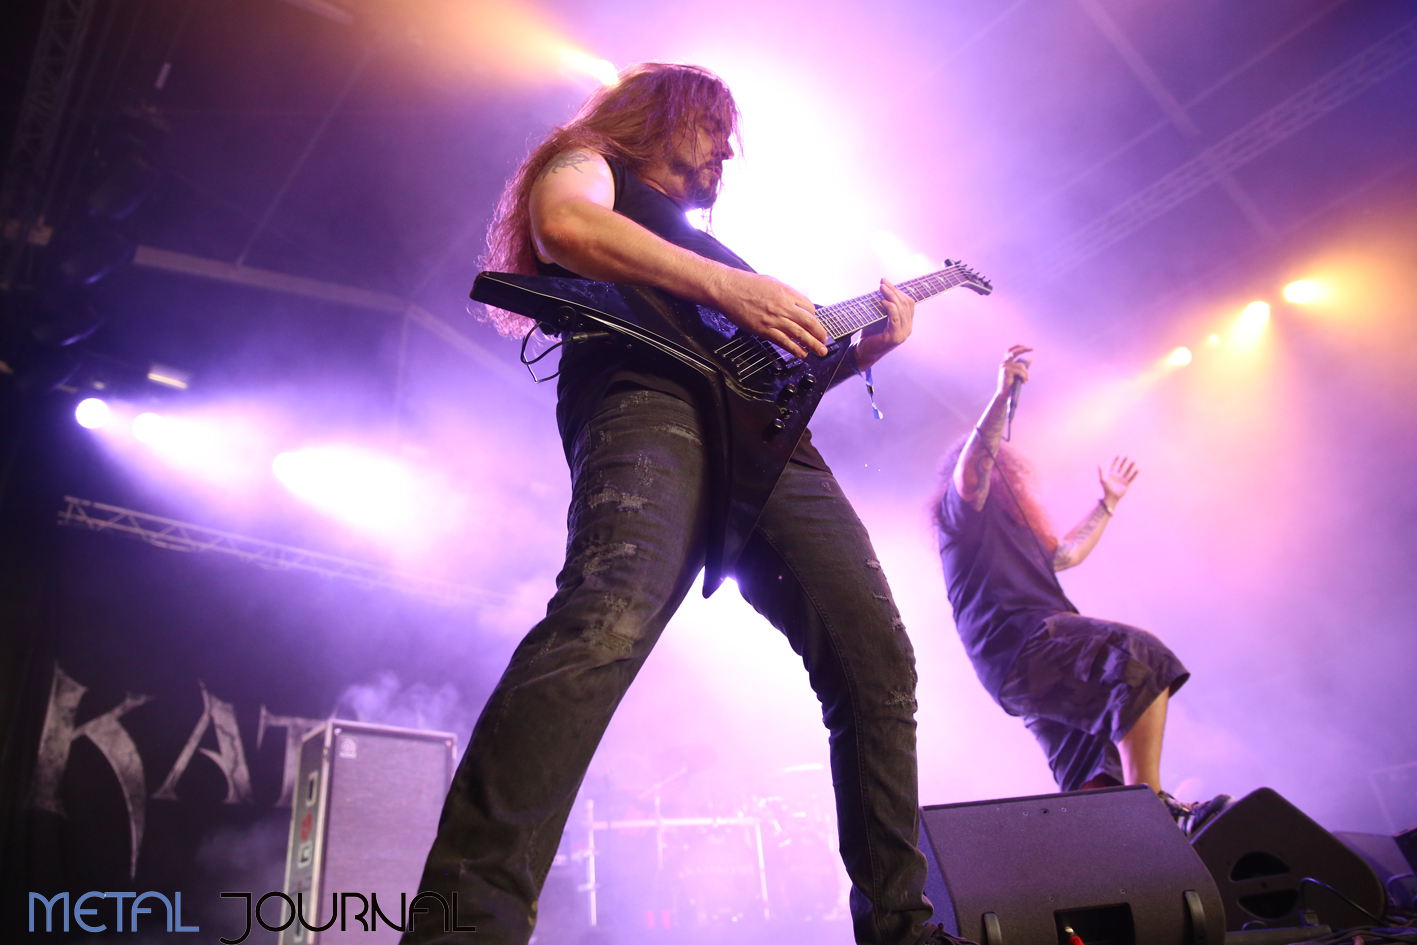 kataklysm rock fest 18 - metal journal pic 1